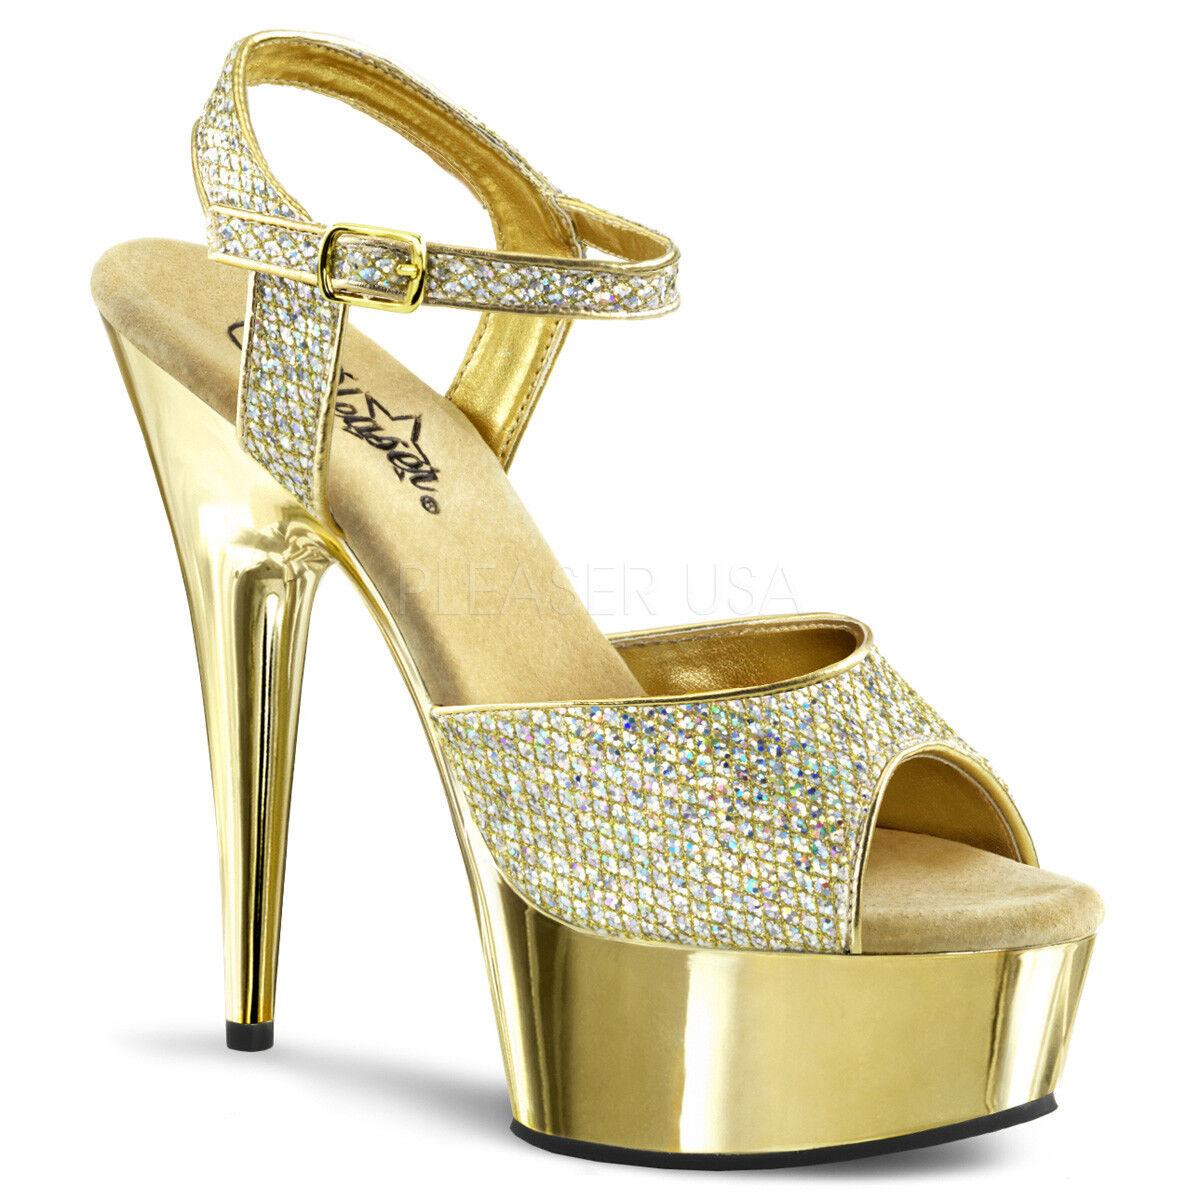 Pleaser DELIGHT-609G Platforms Exotic Dancing Gold Multi Glitter Chrome Heels